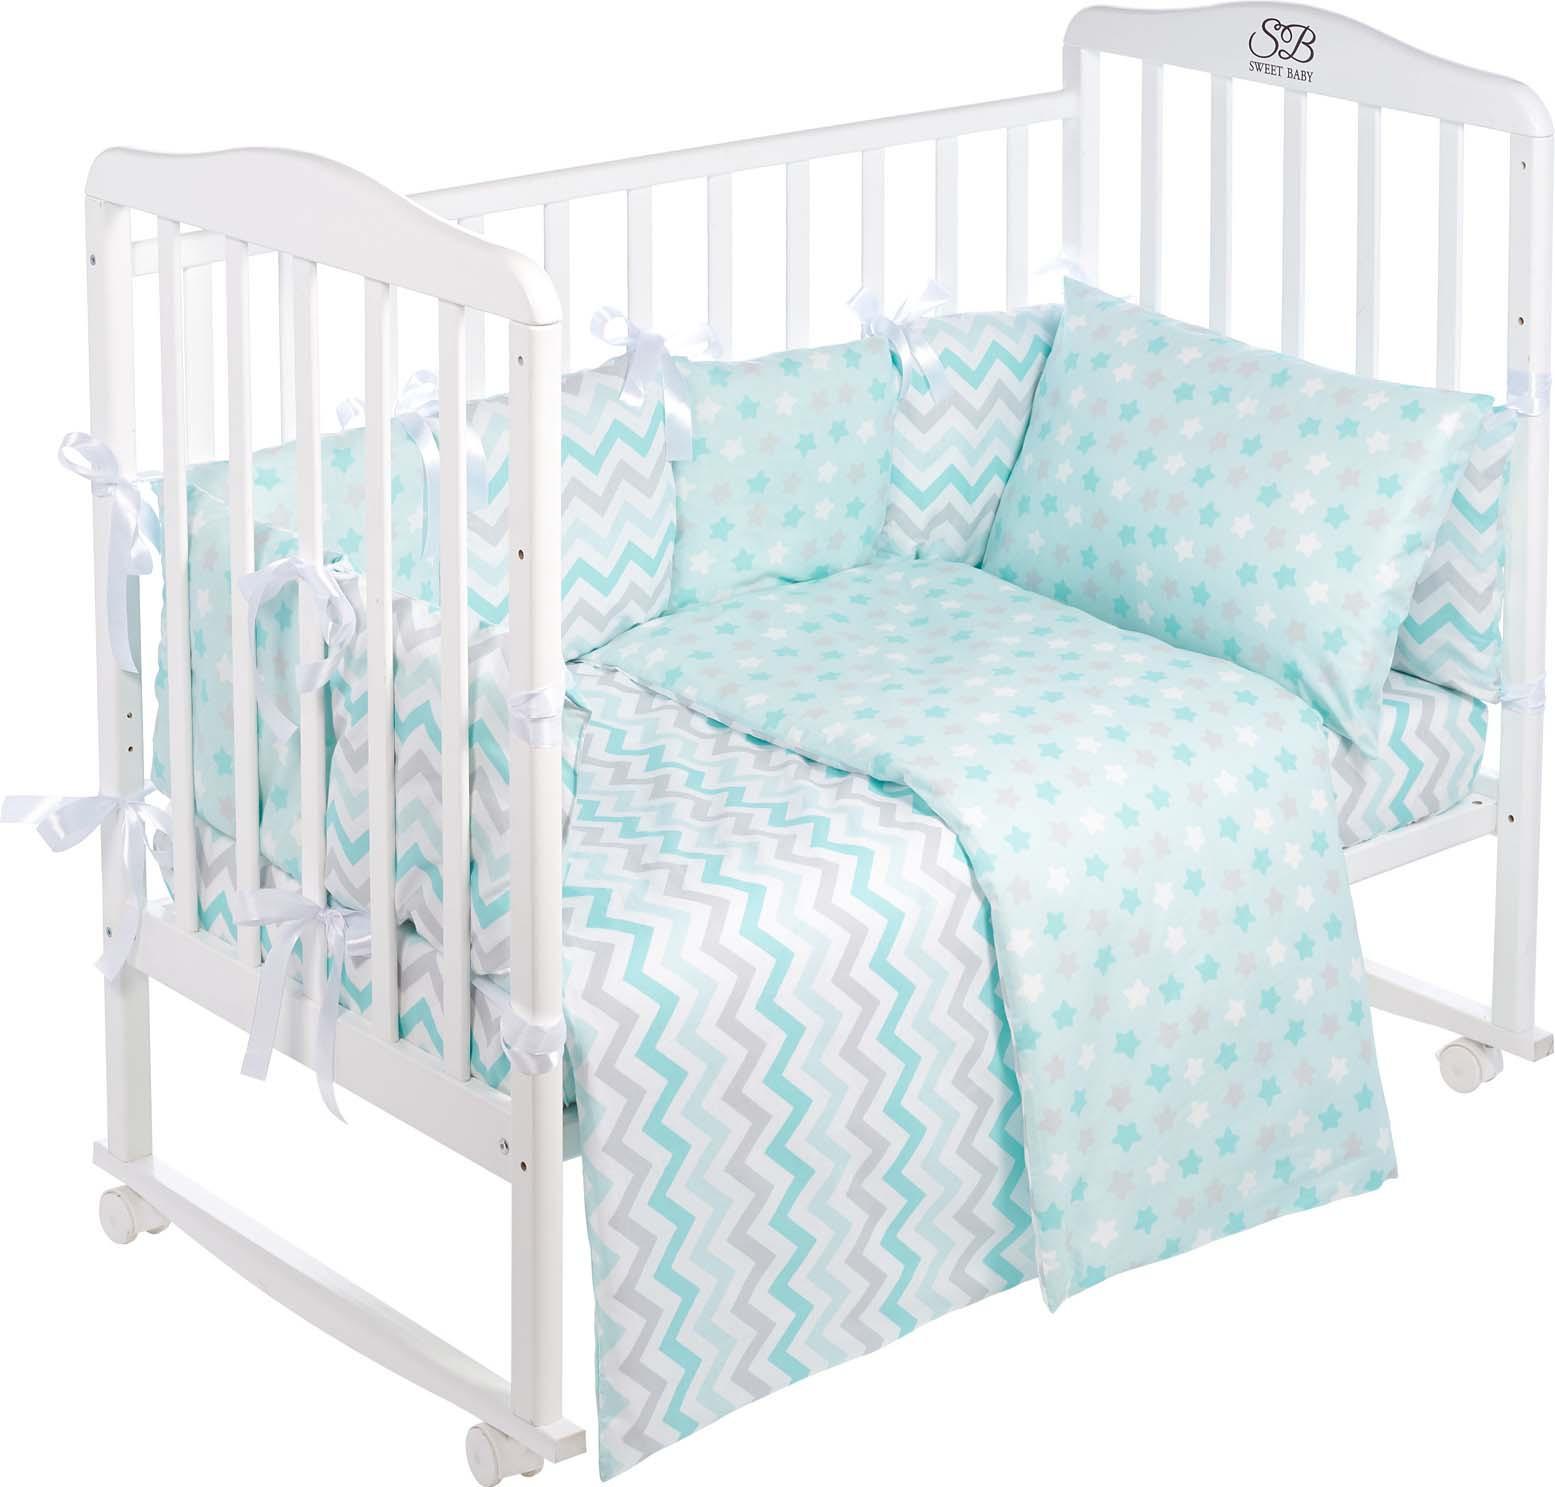 Комплект в кроватку Sweet Baby Anastasia, 419243, голубой, 4 предмета